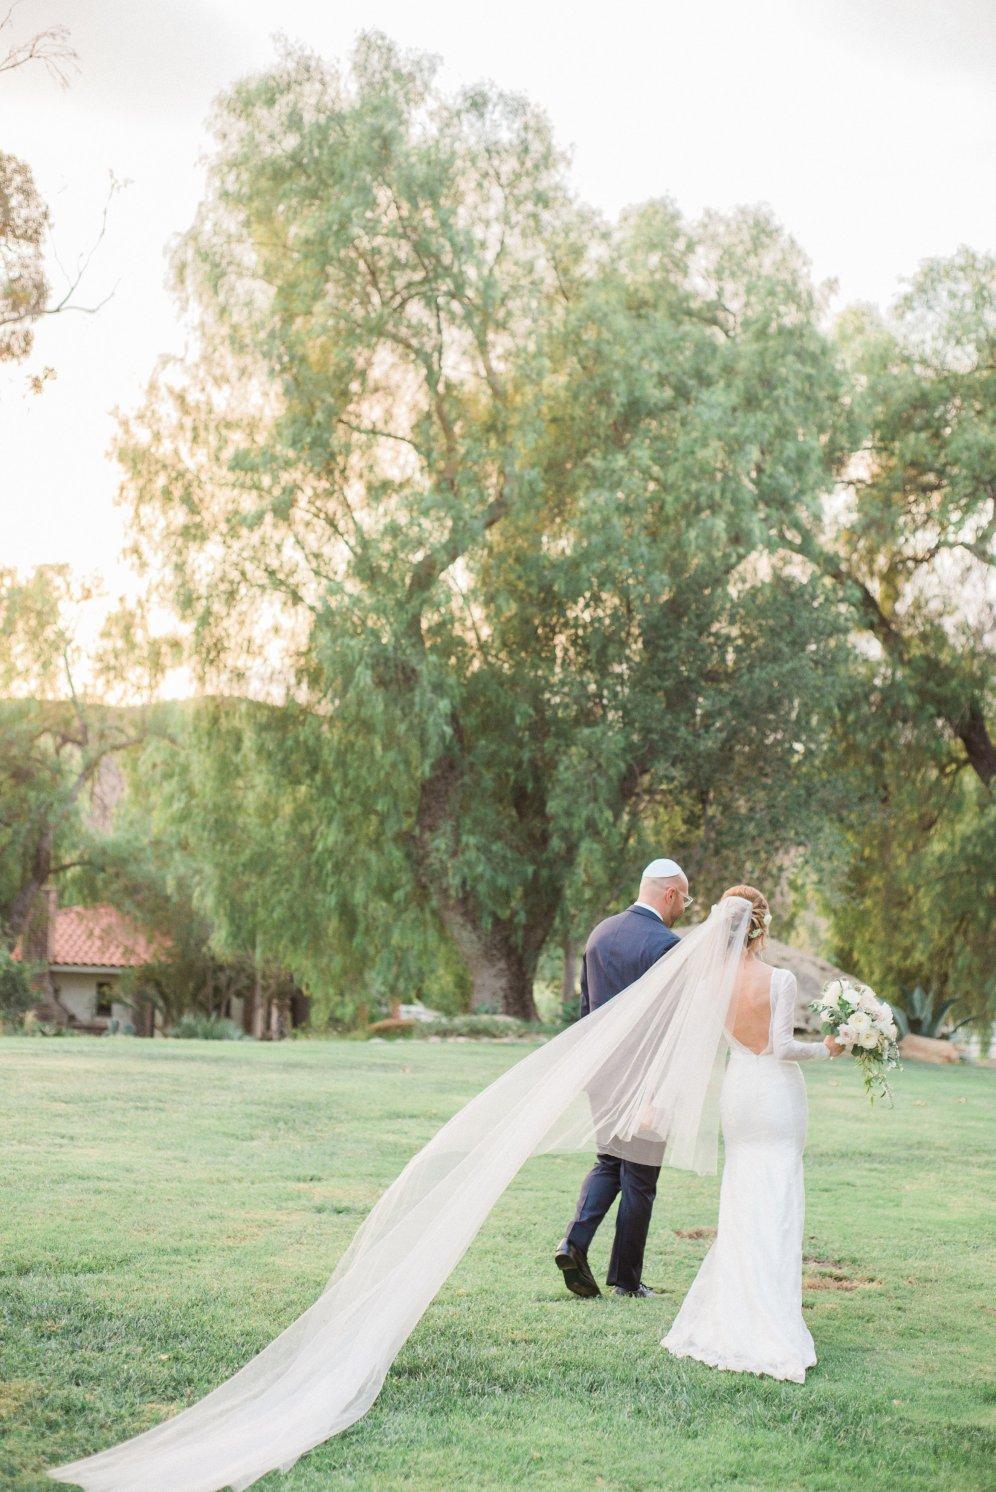 Hummingbird-Nest-Ranch-Wedding-Jewish-Rustic-Chic-62